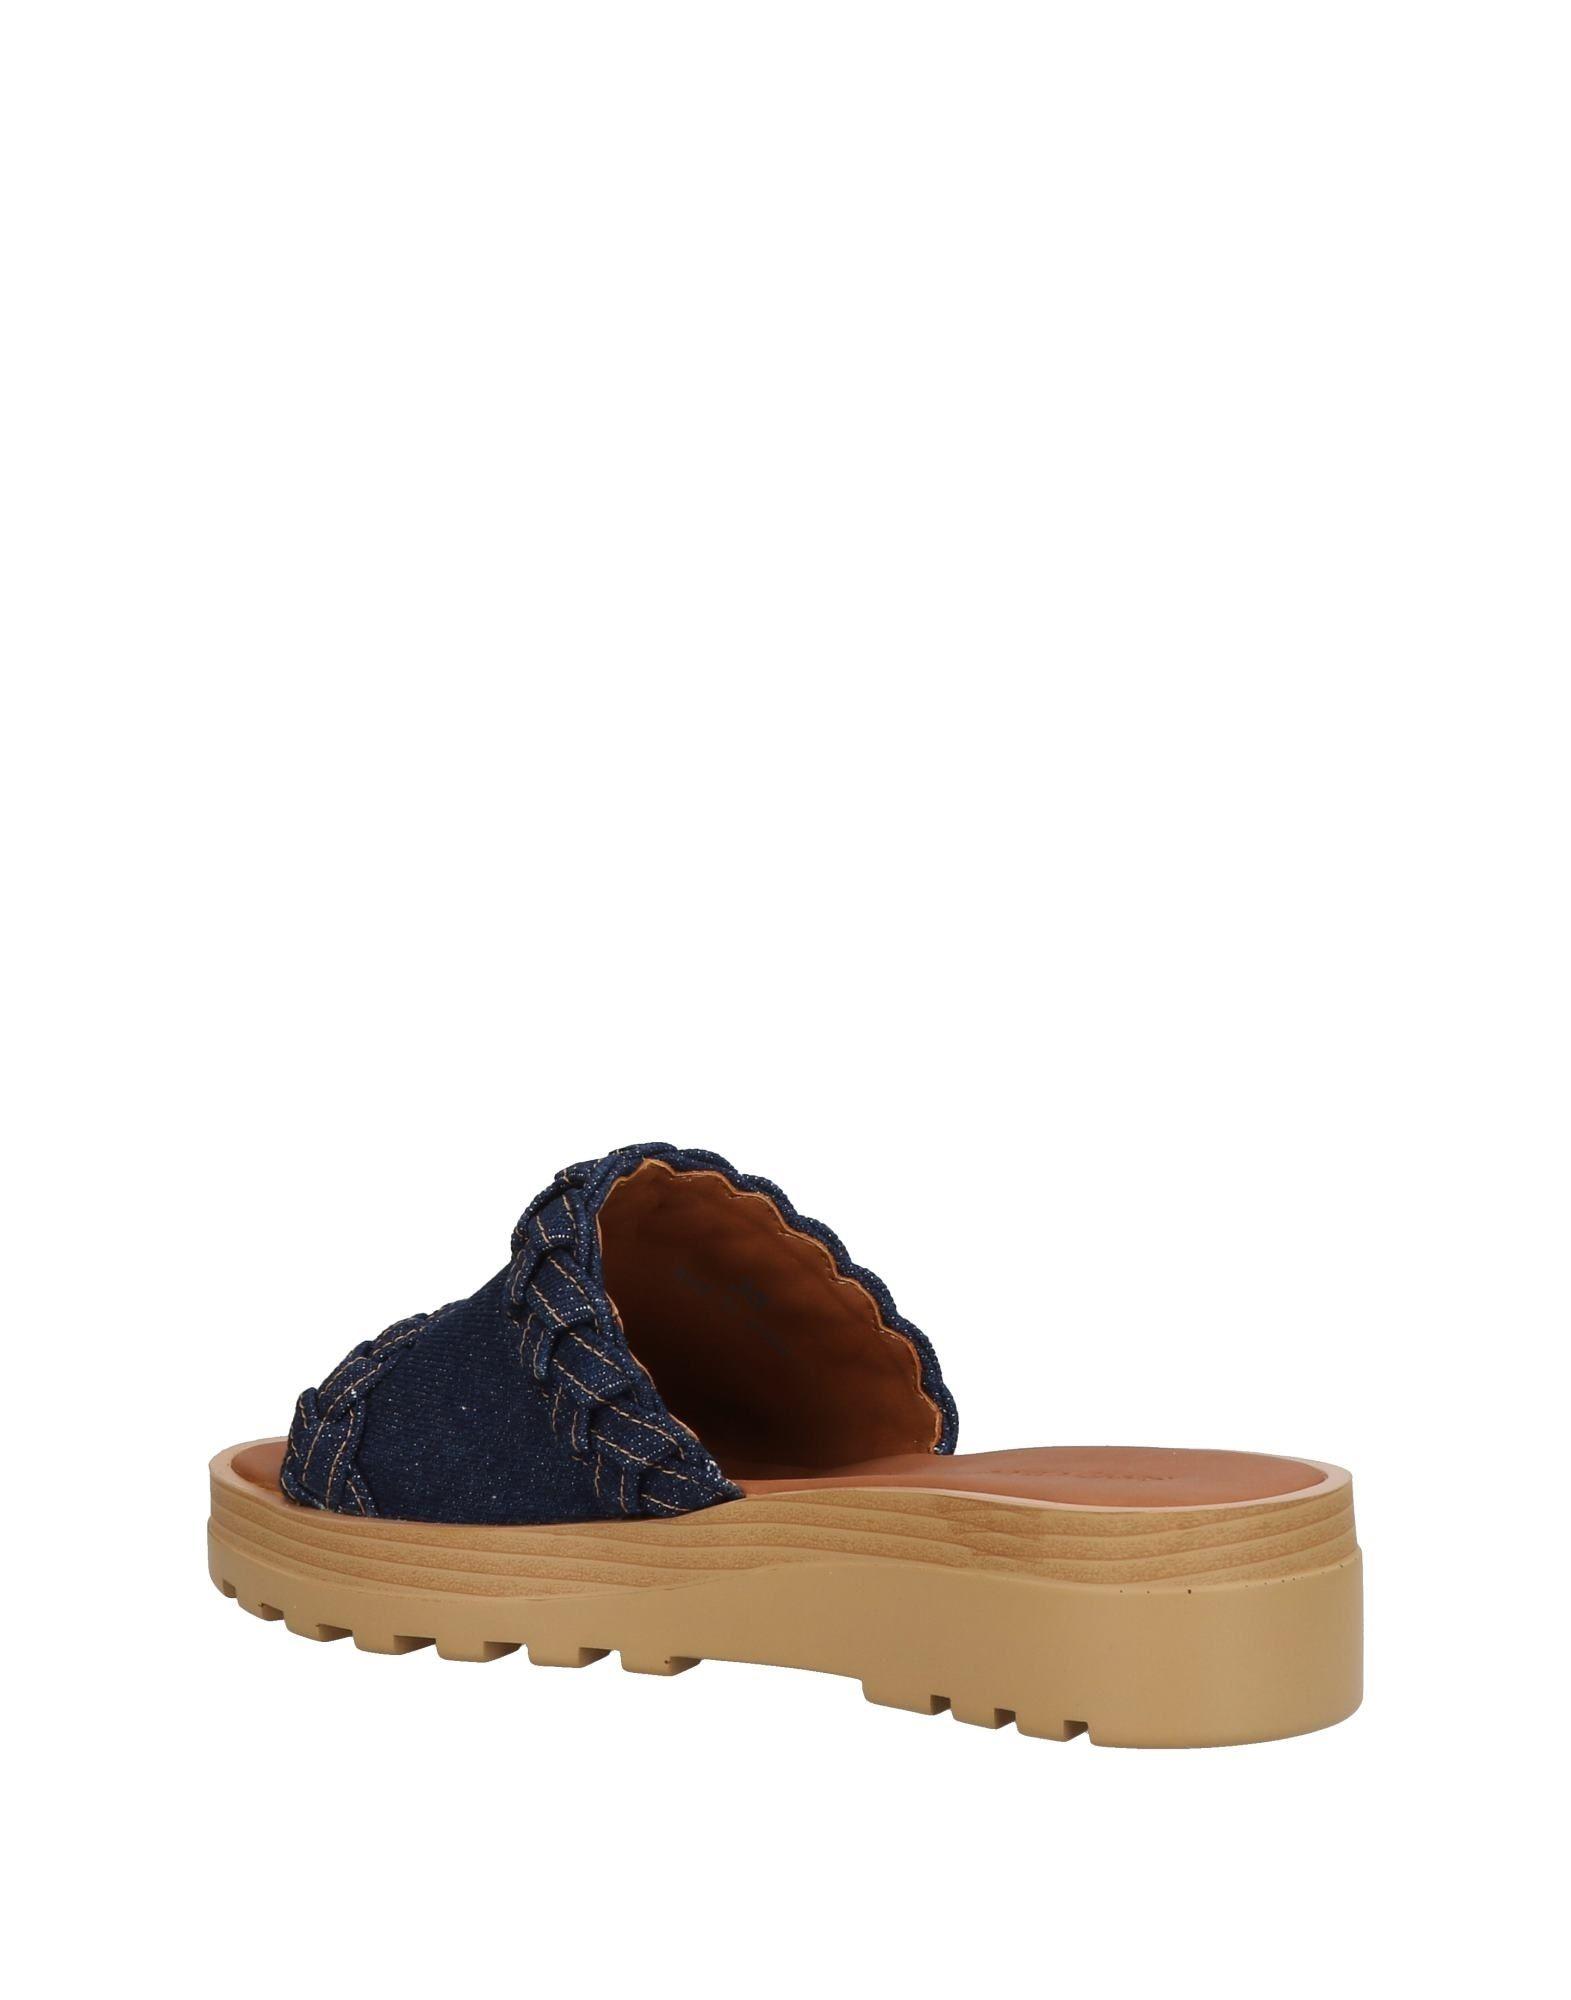 Sandales See By Chloé Femme - Sandales See By Chloé sur